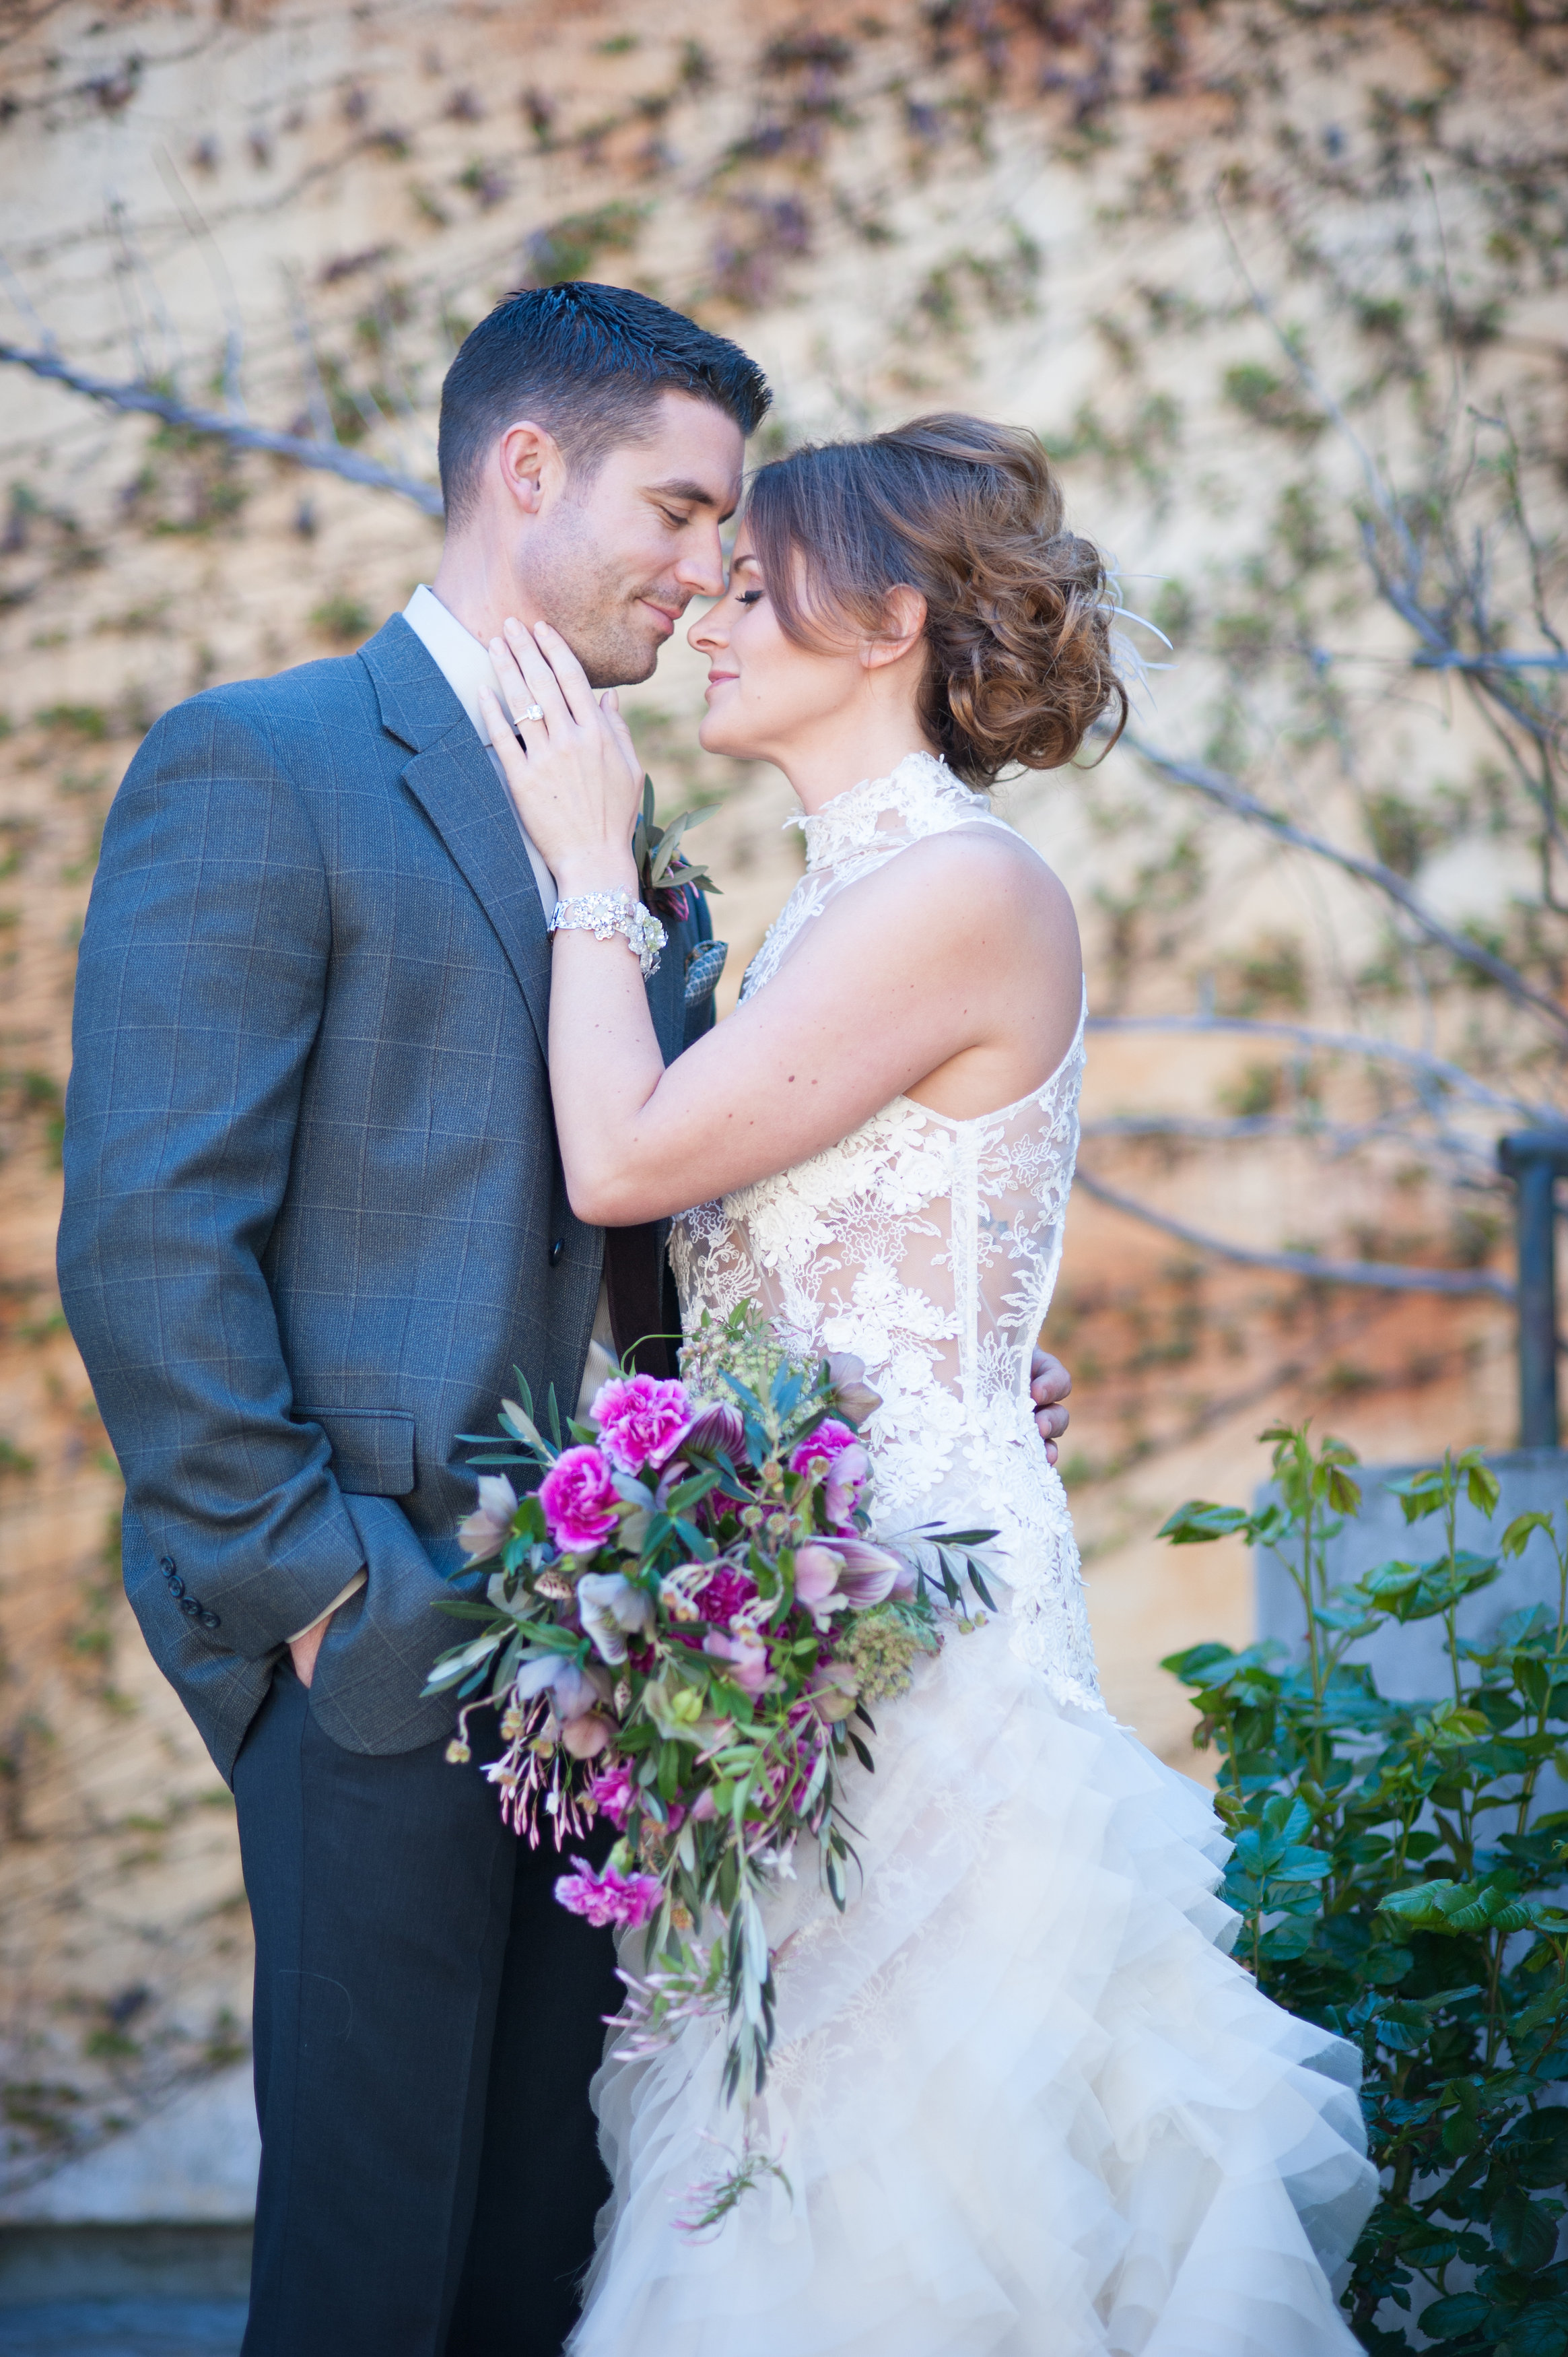 Mindy_Erik_Kenwood_Inn_Sonoma_Wedding_0201.jpg